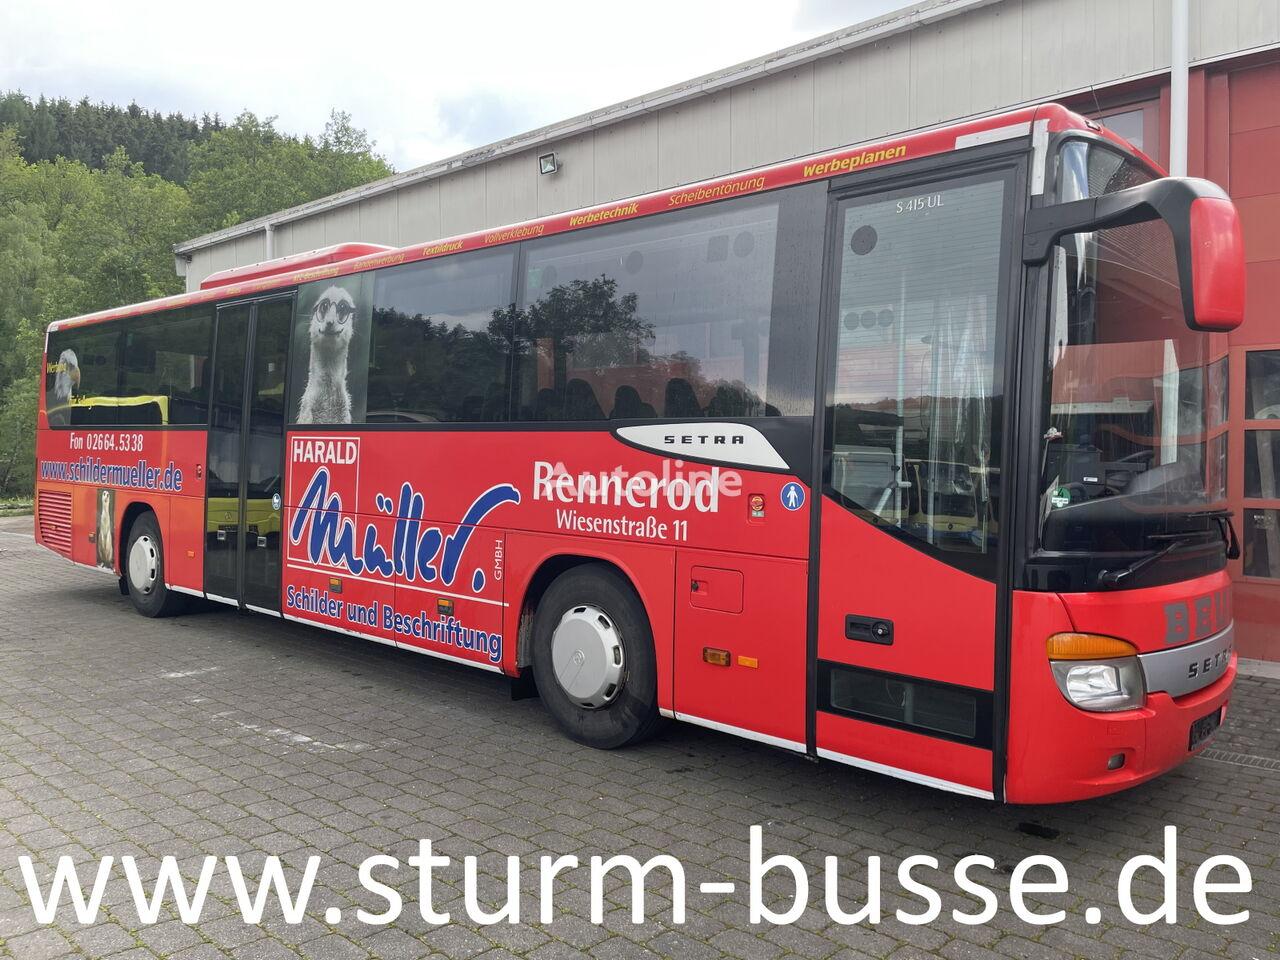 SETRA MultiClass S 415 UL prigradski autobus